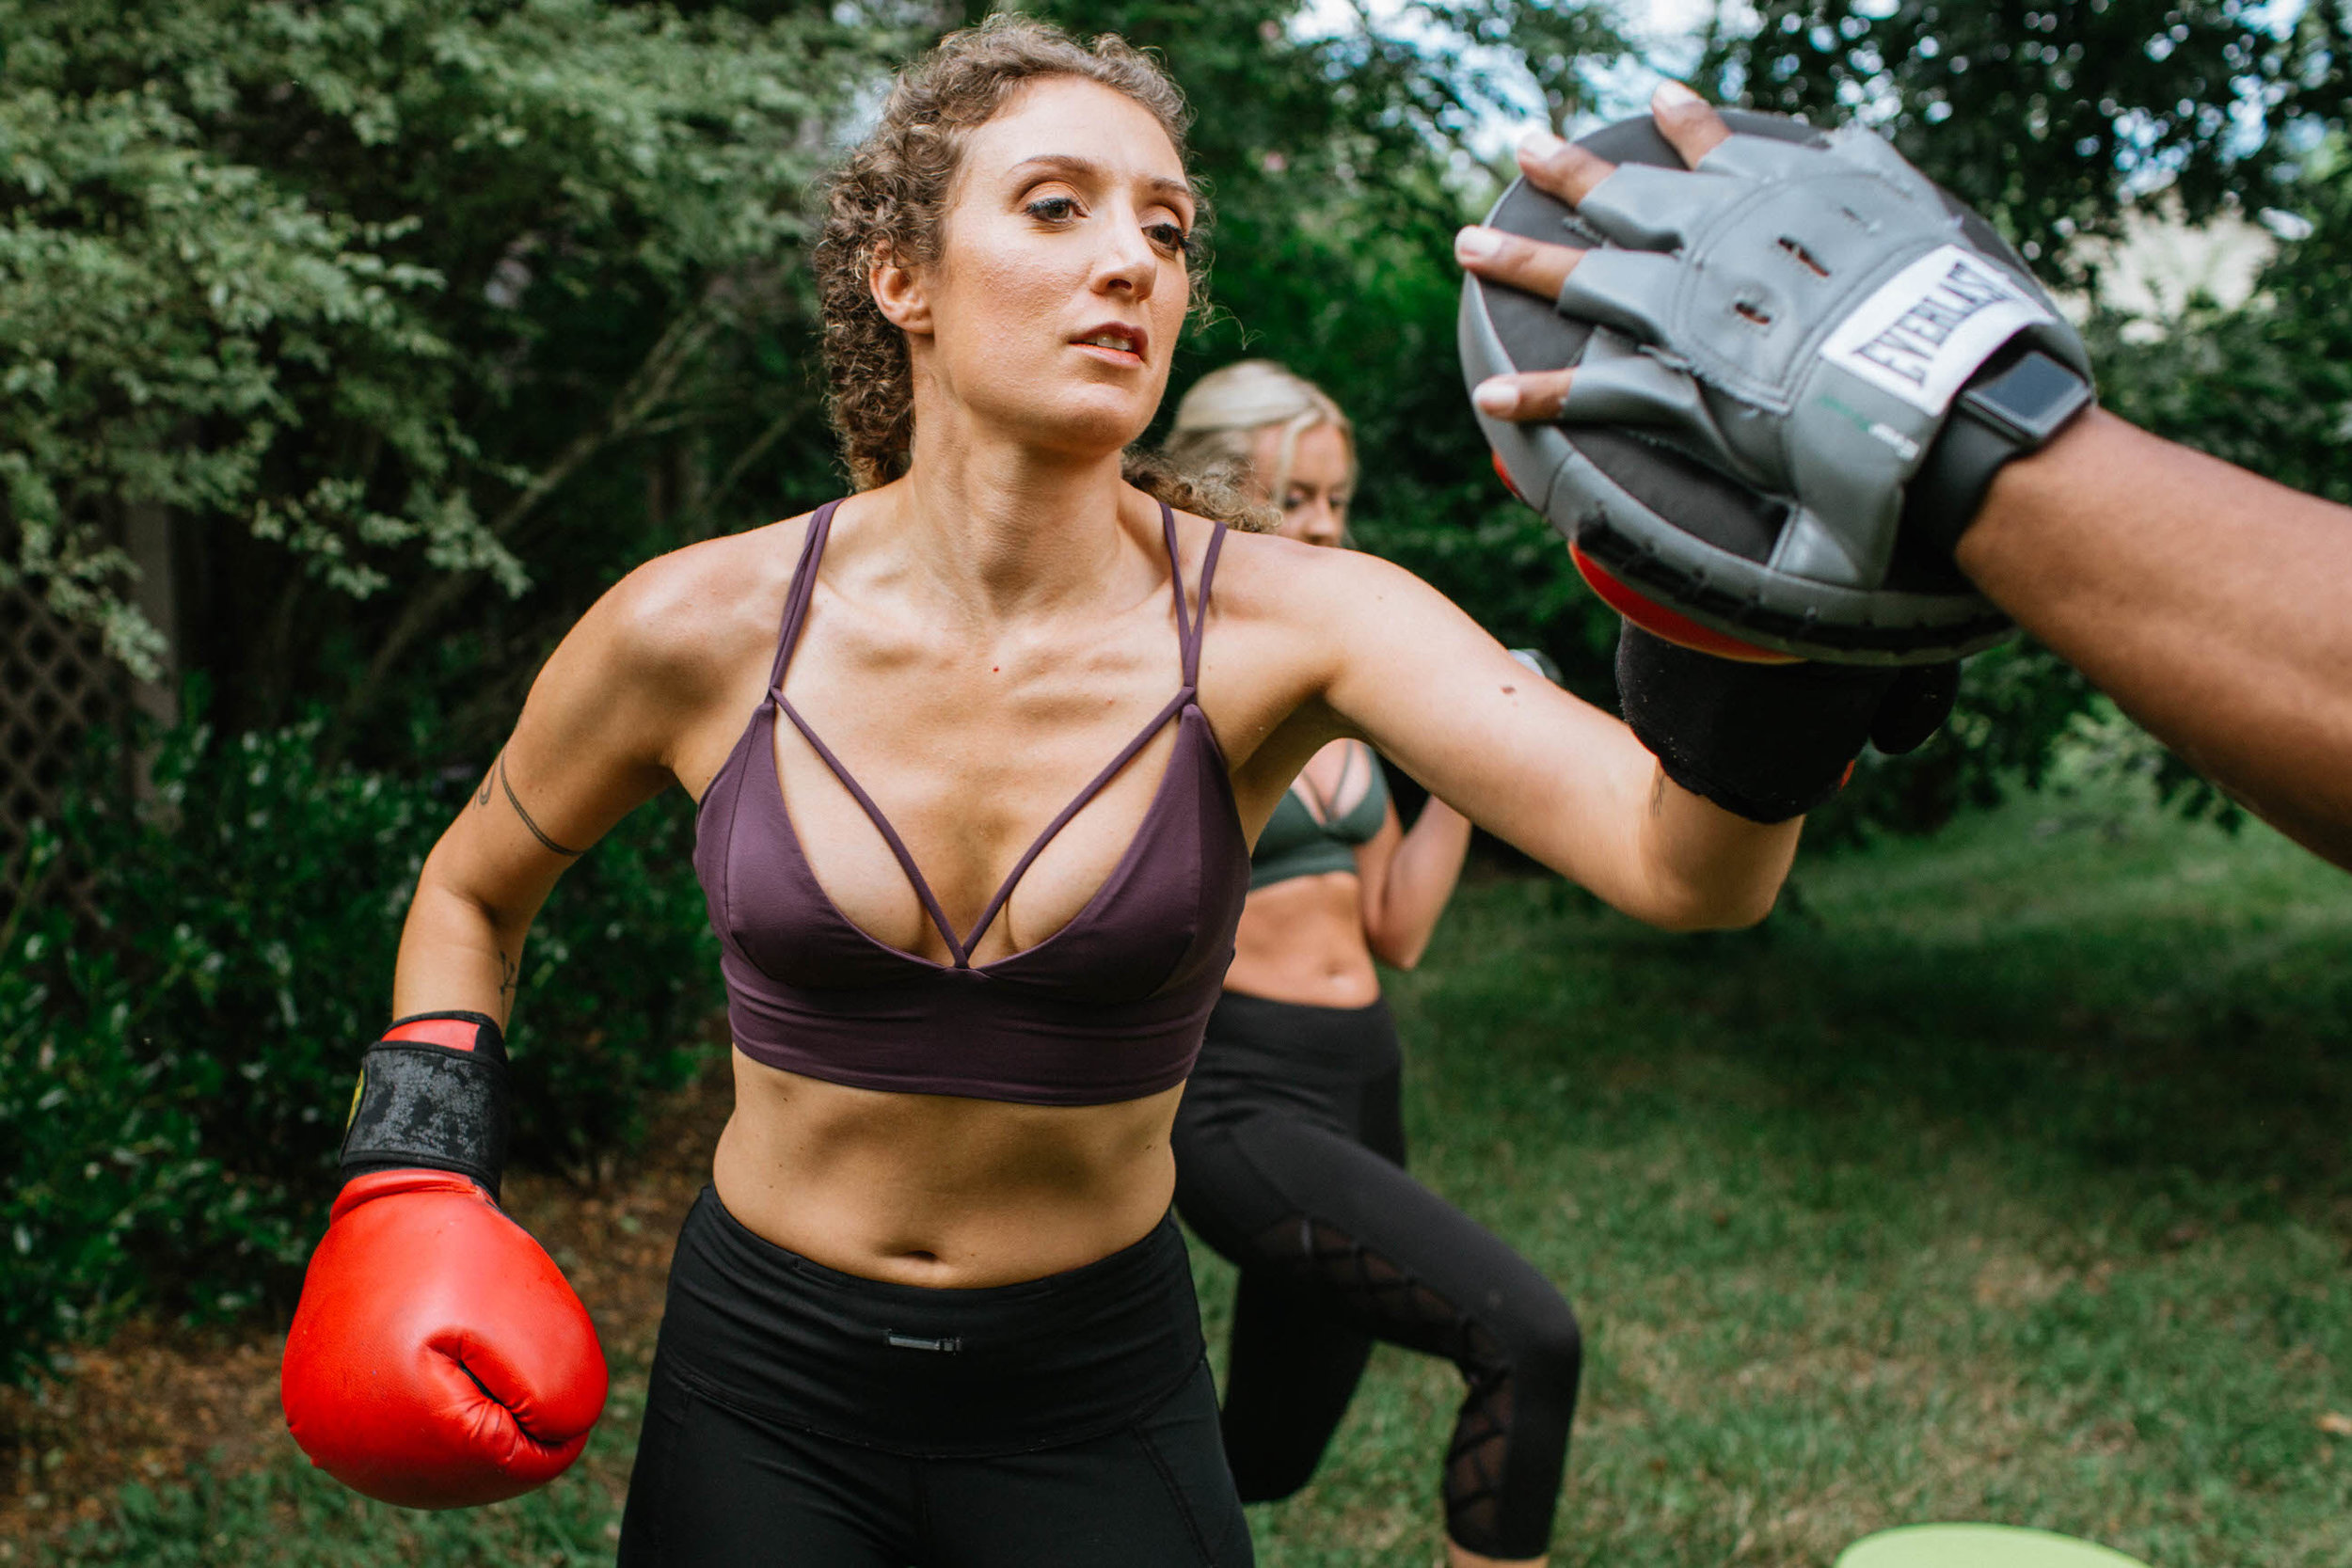 fitness-photoshoot-7998.jpg